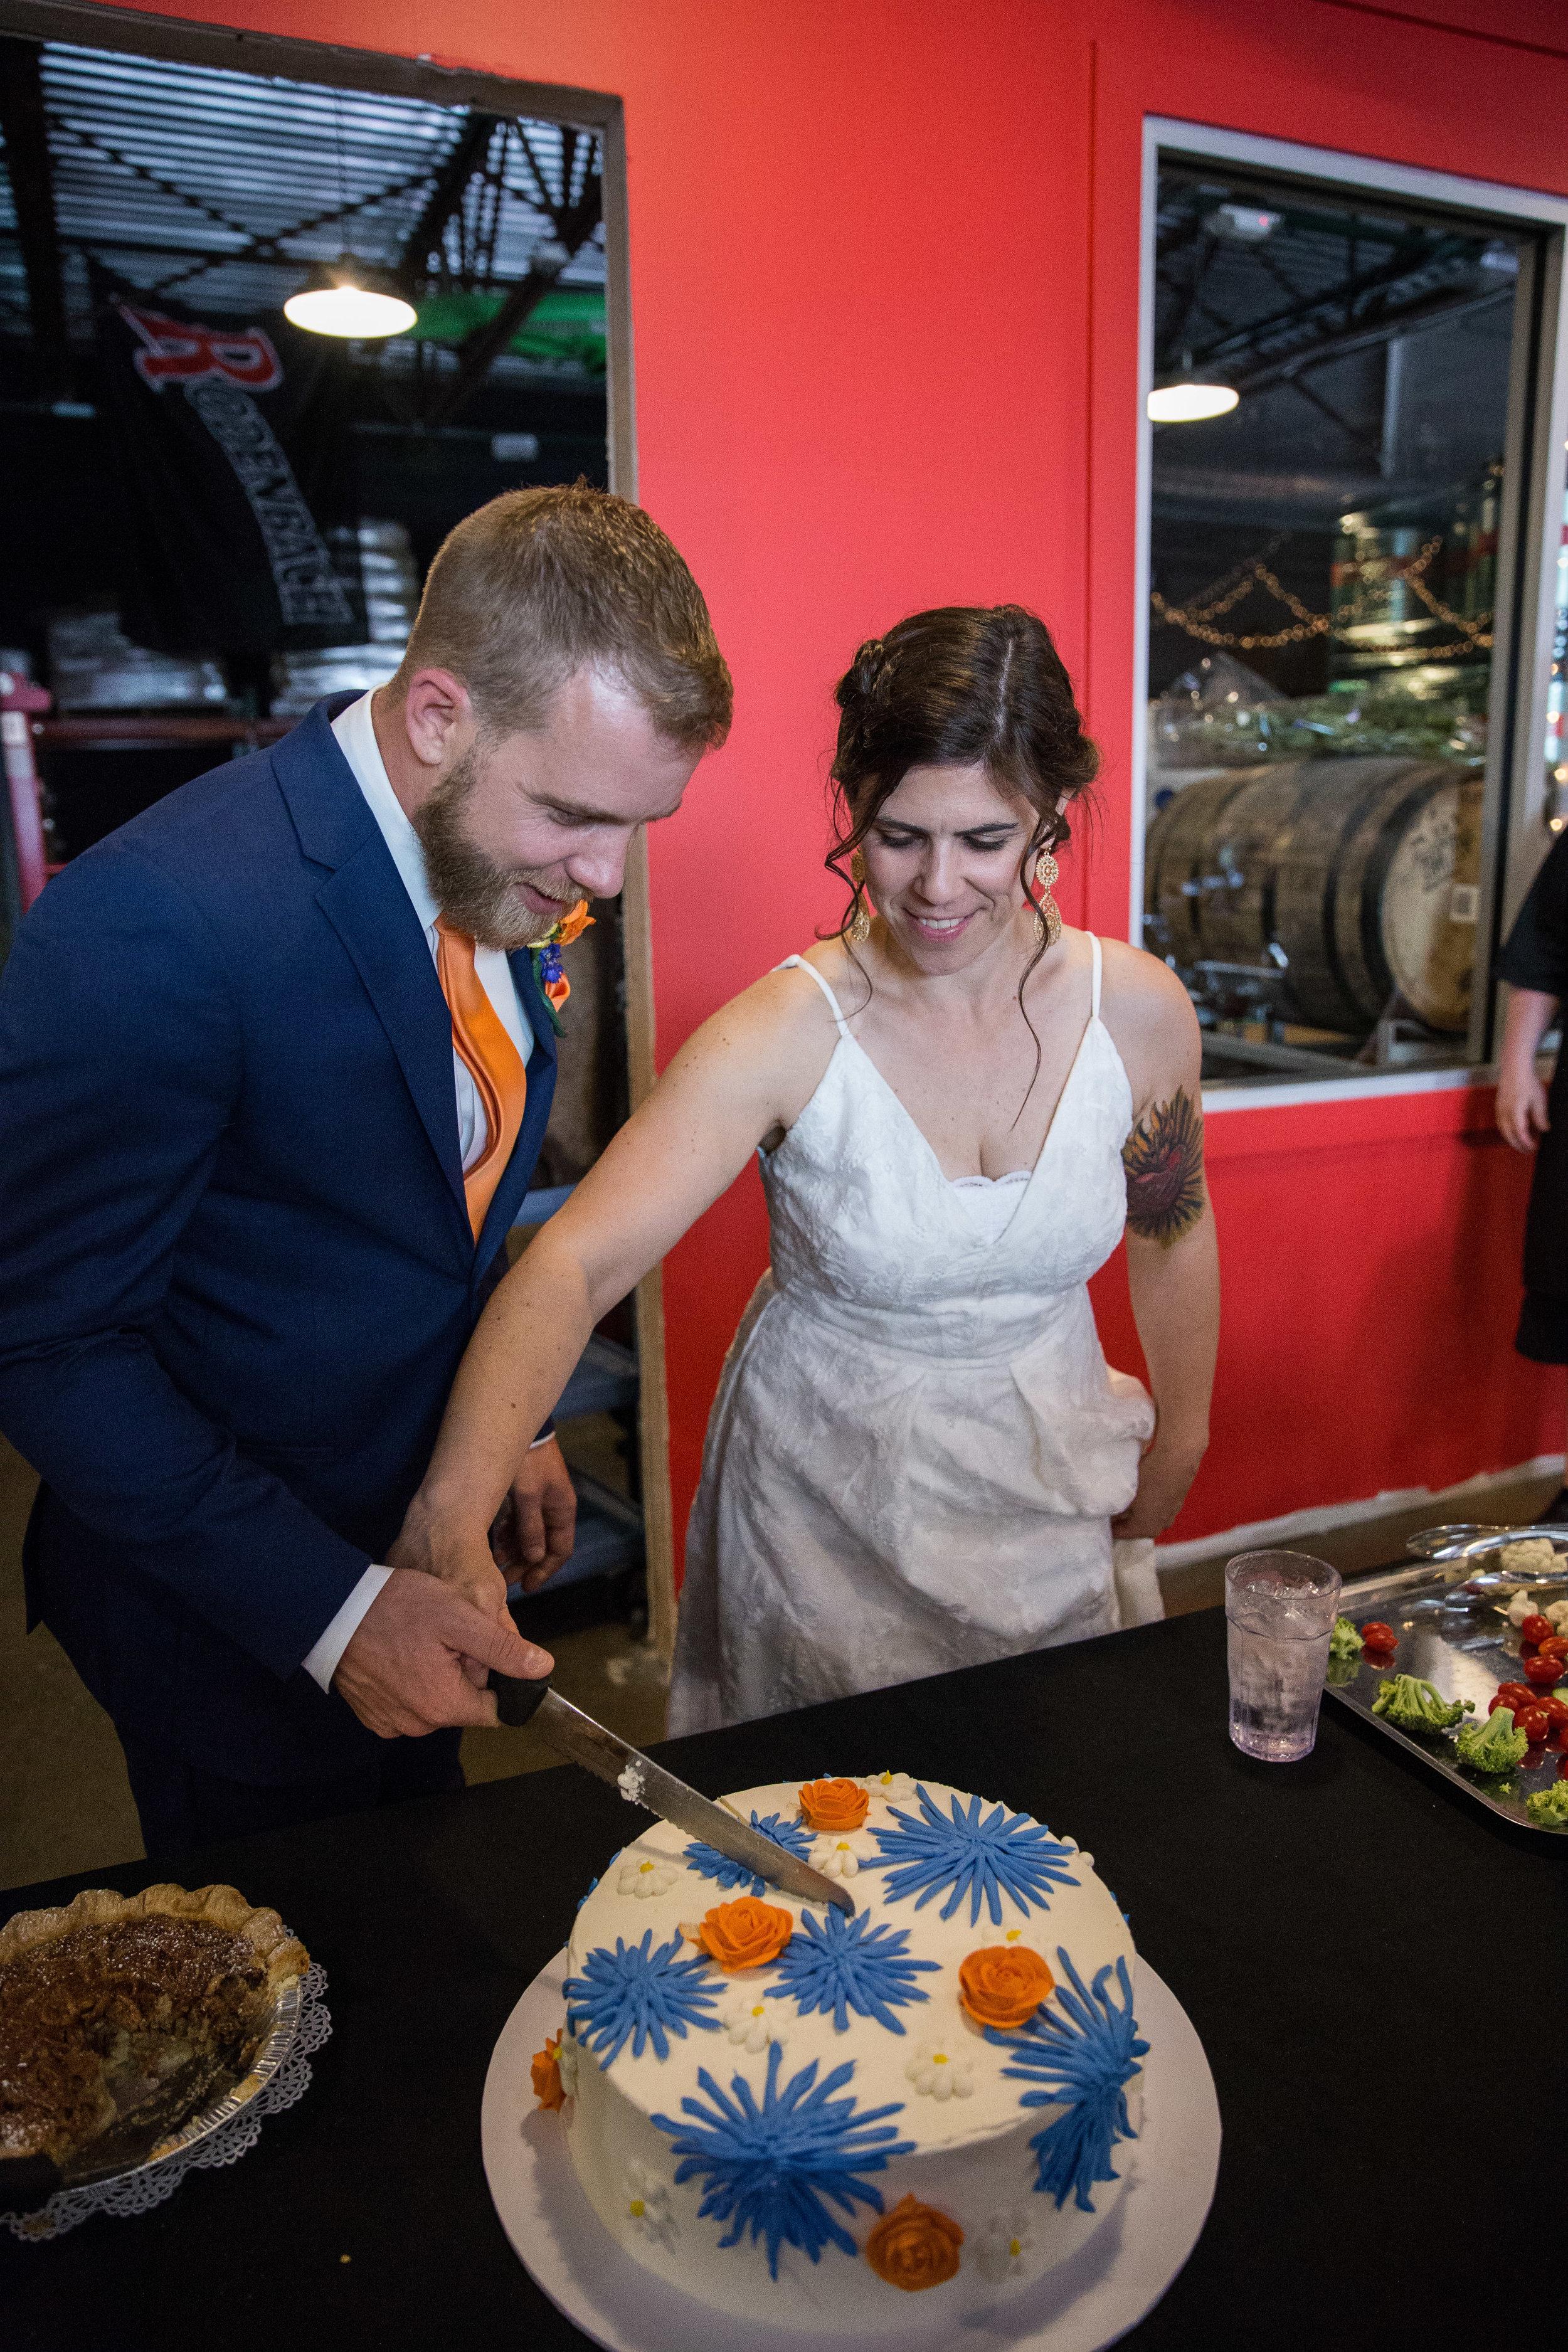 Natalie and Dallas Mooney Wedding 6-8-19_Tania Watt Photography-543.jpg